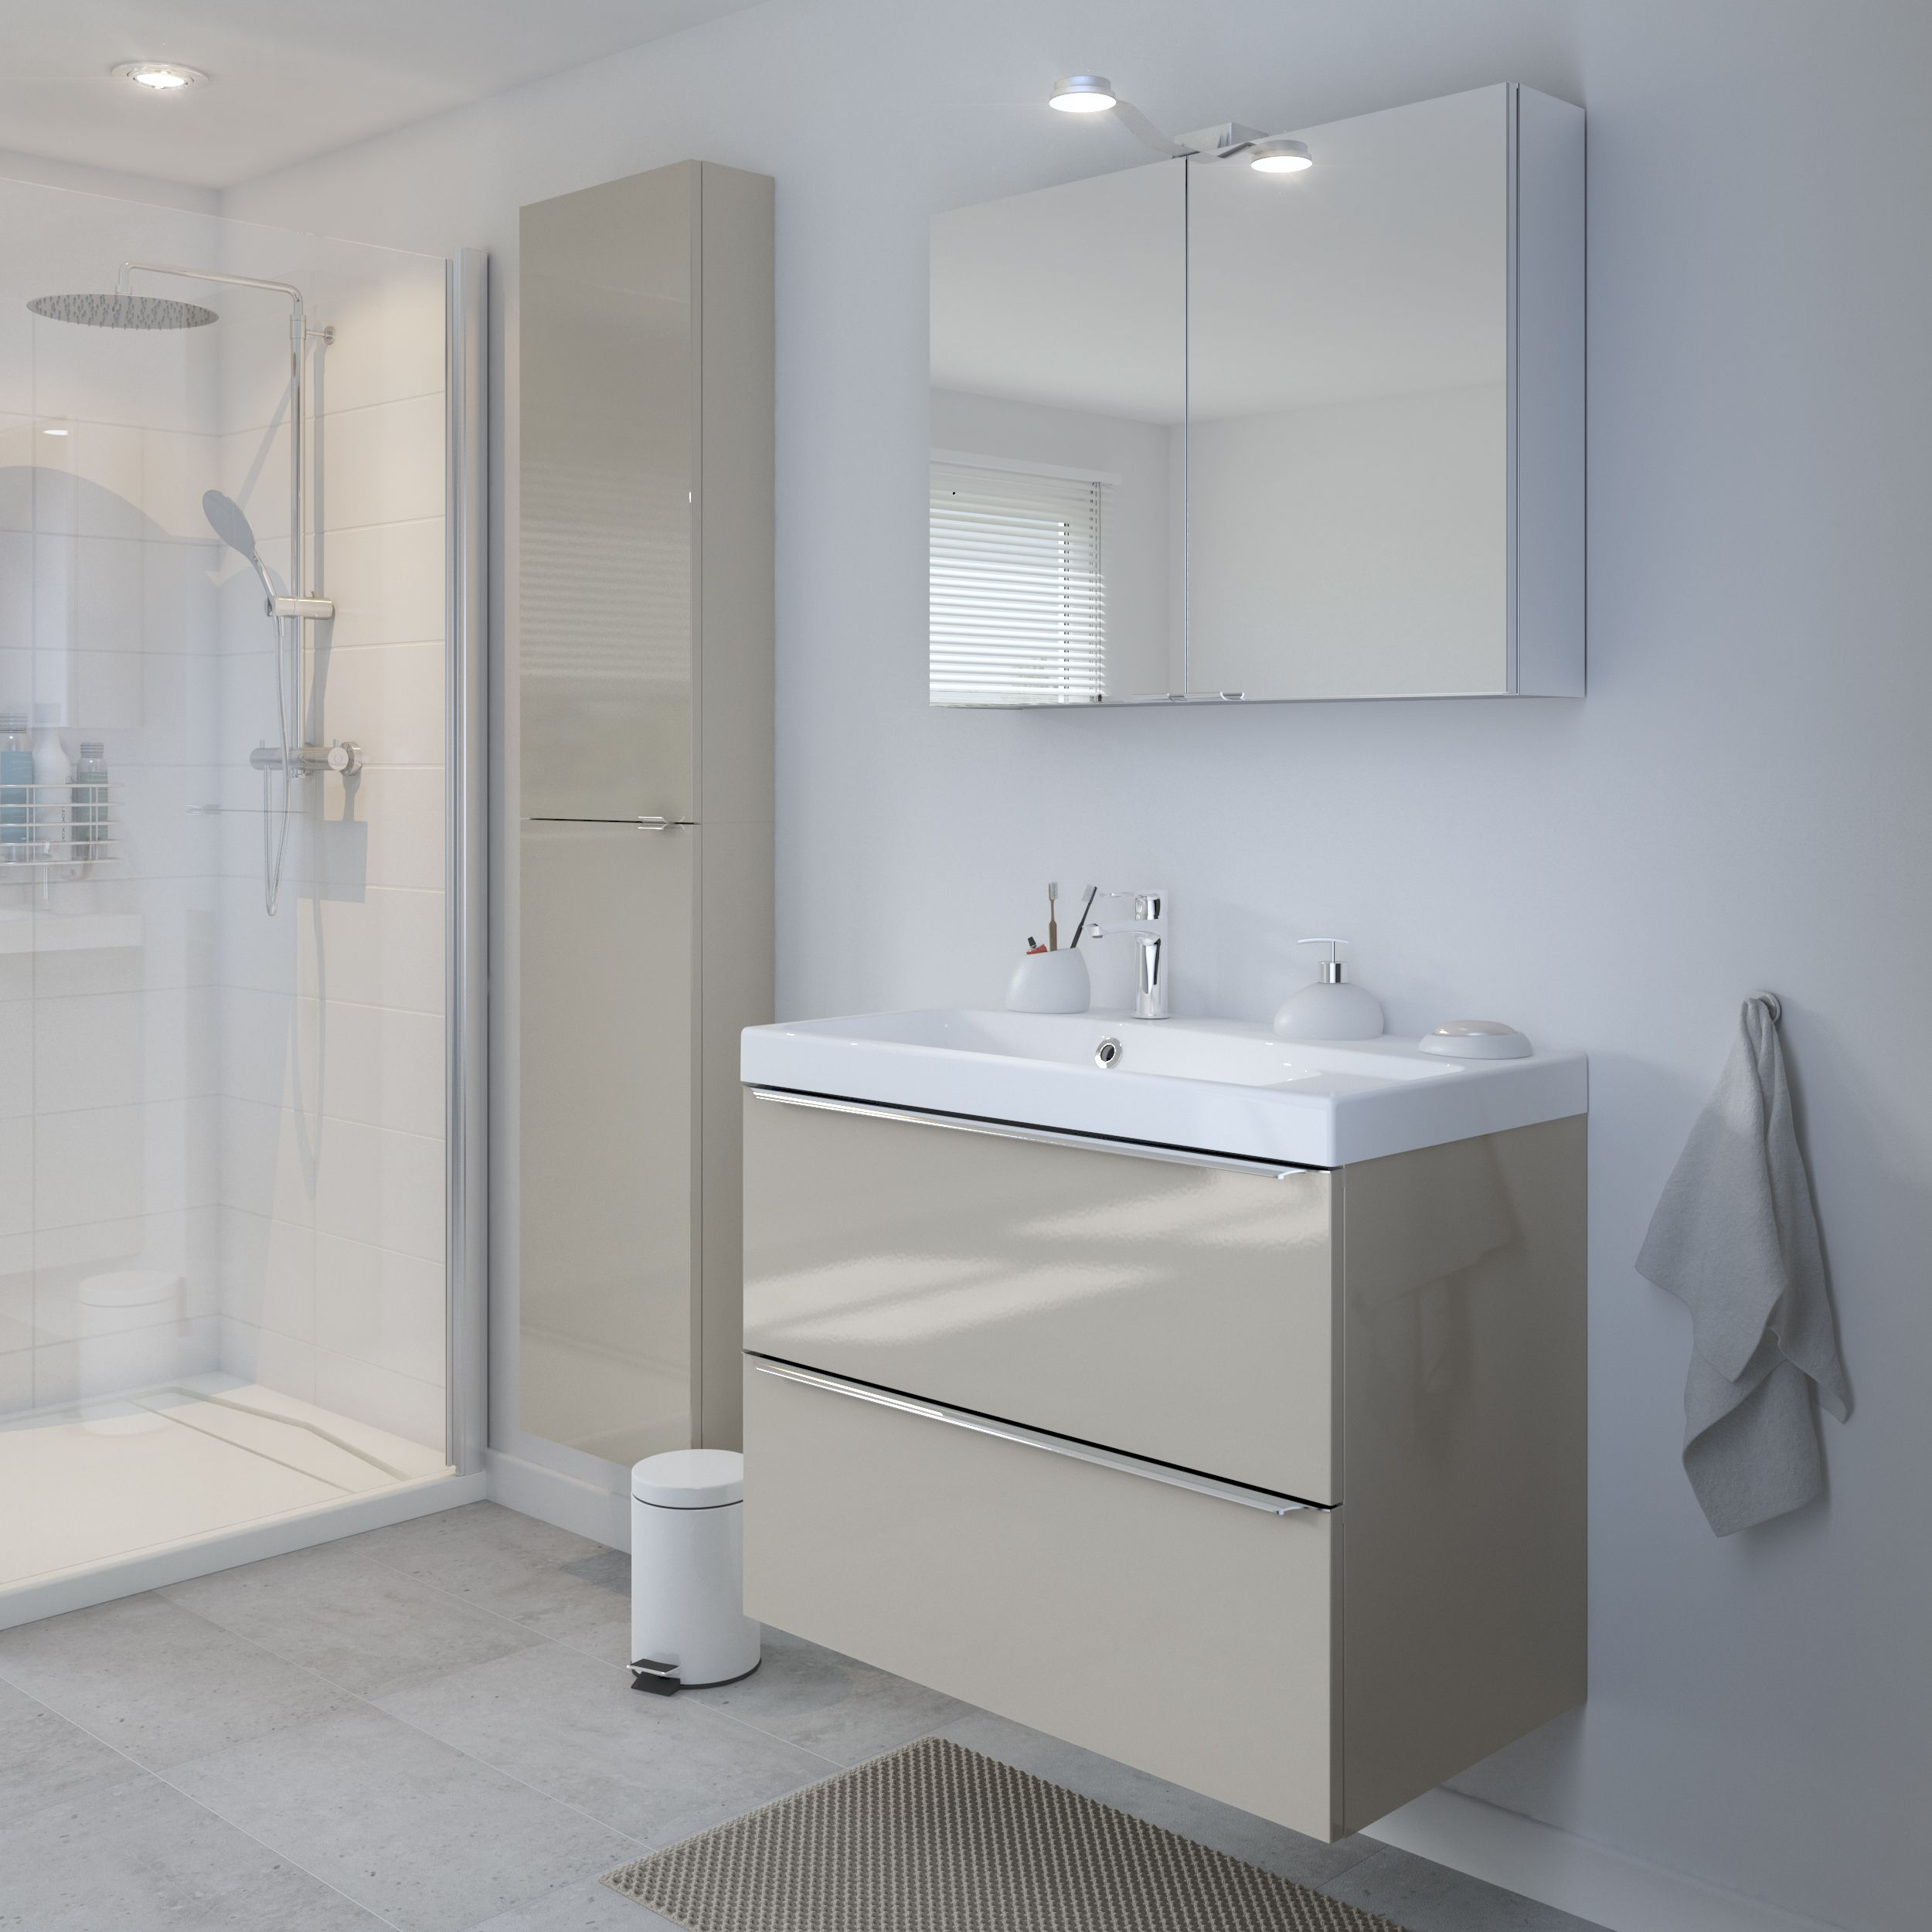 Bathroom Planner Online Free